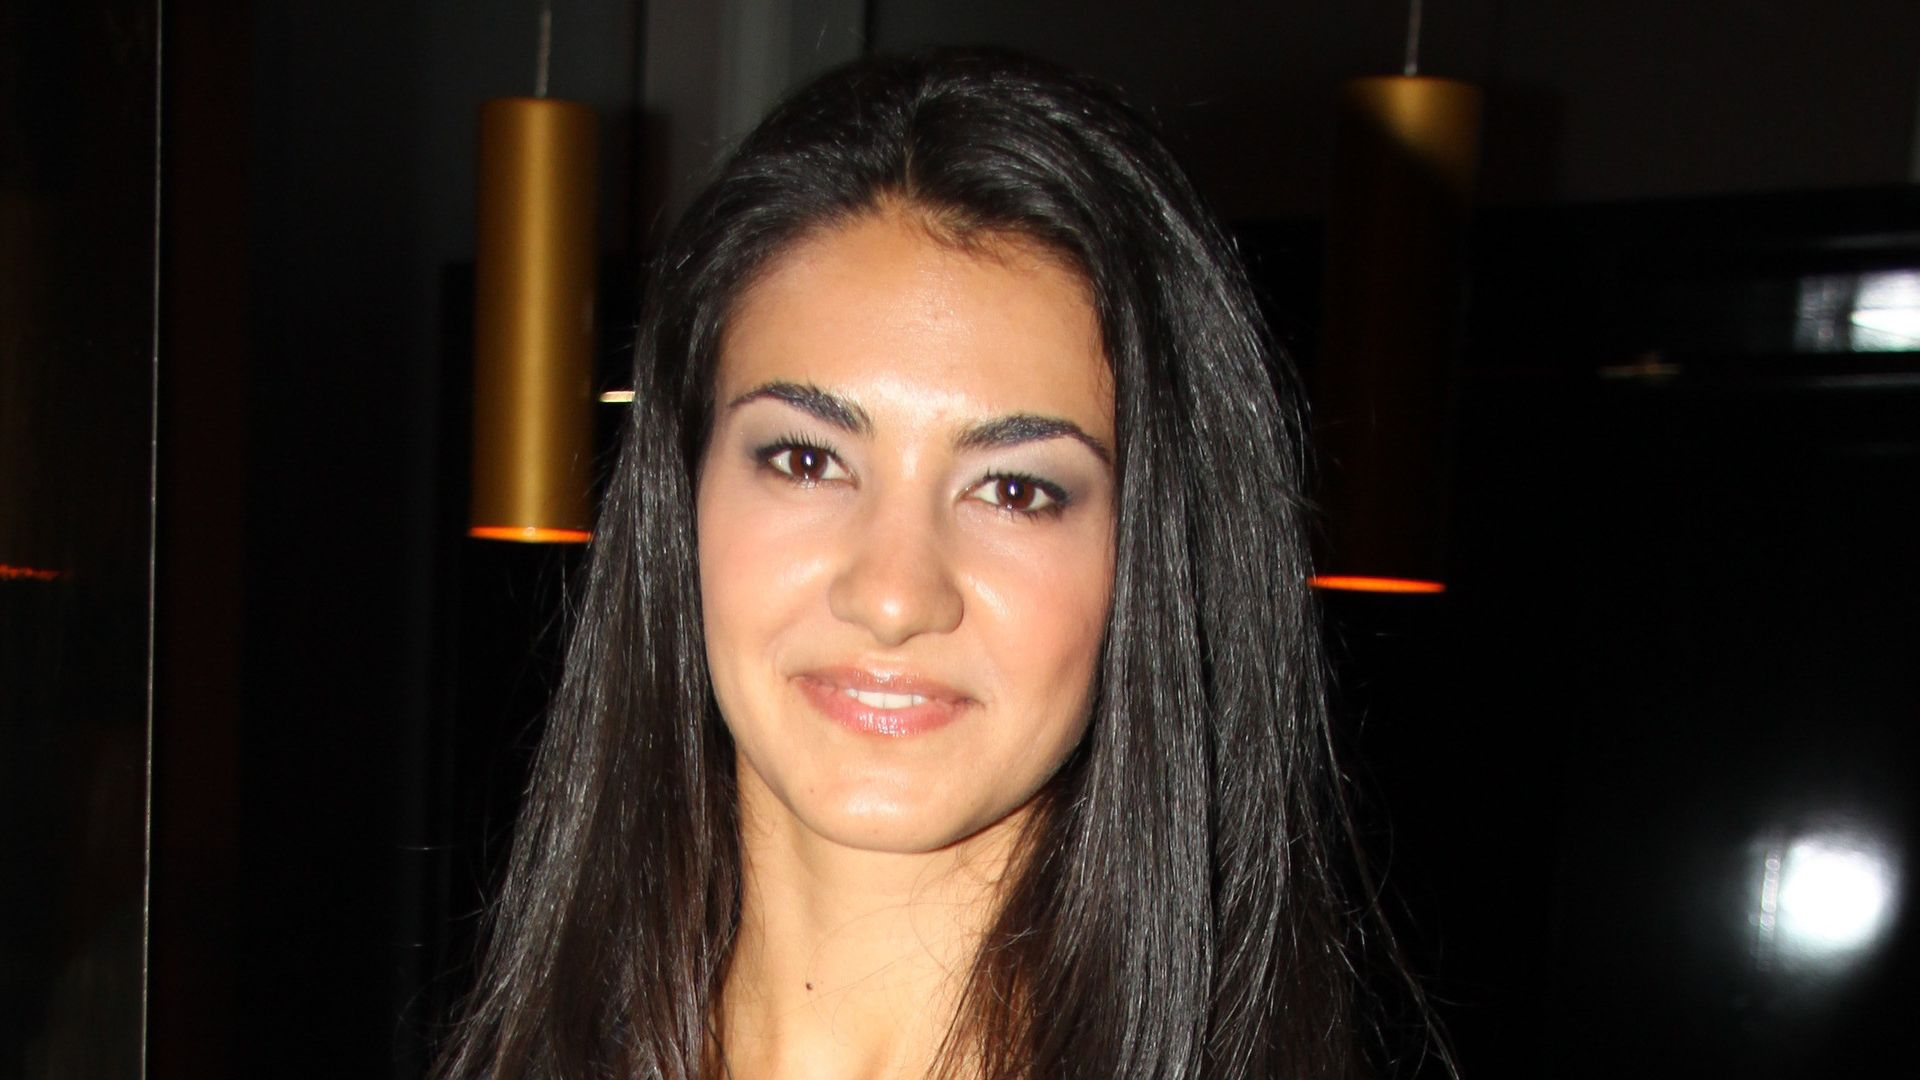 Rosetta Pedone